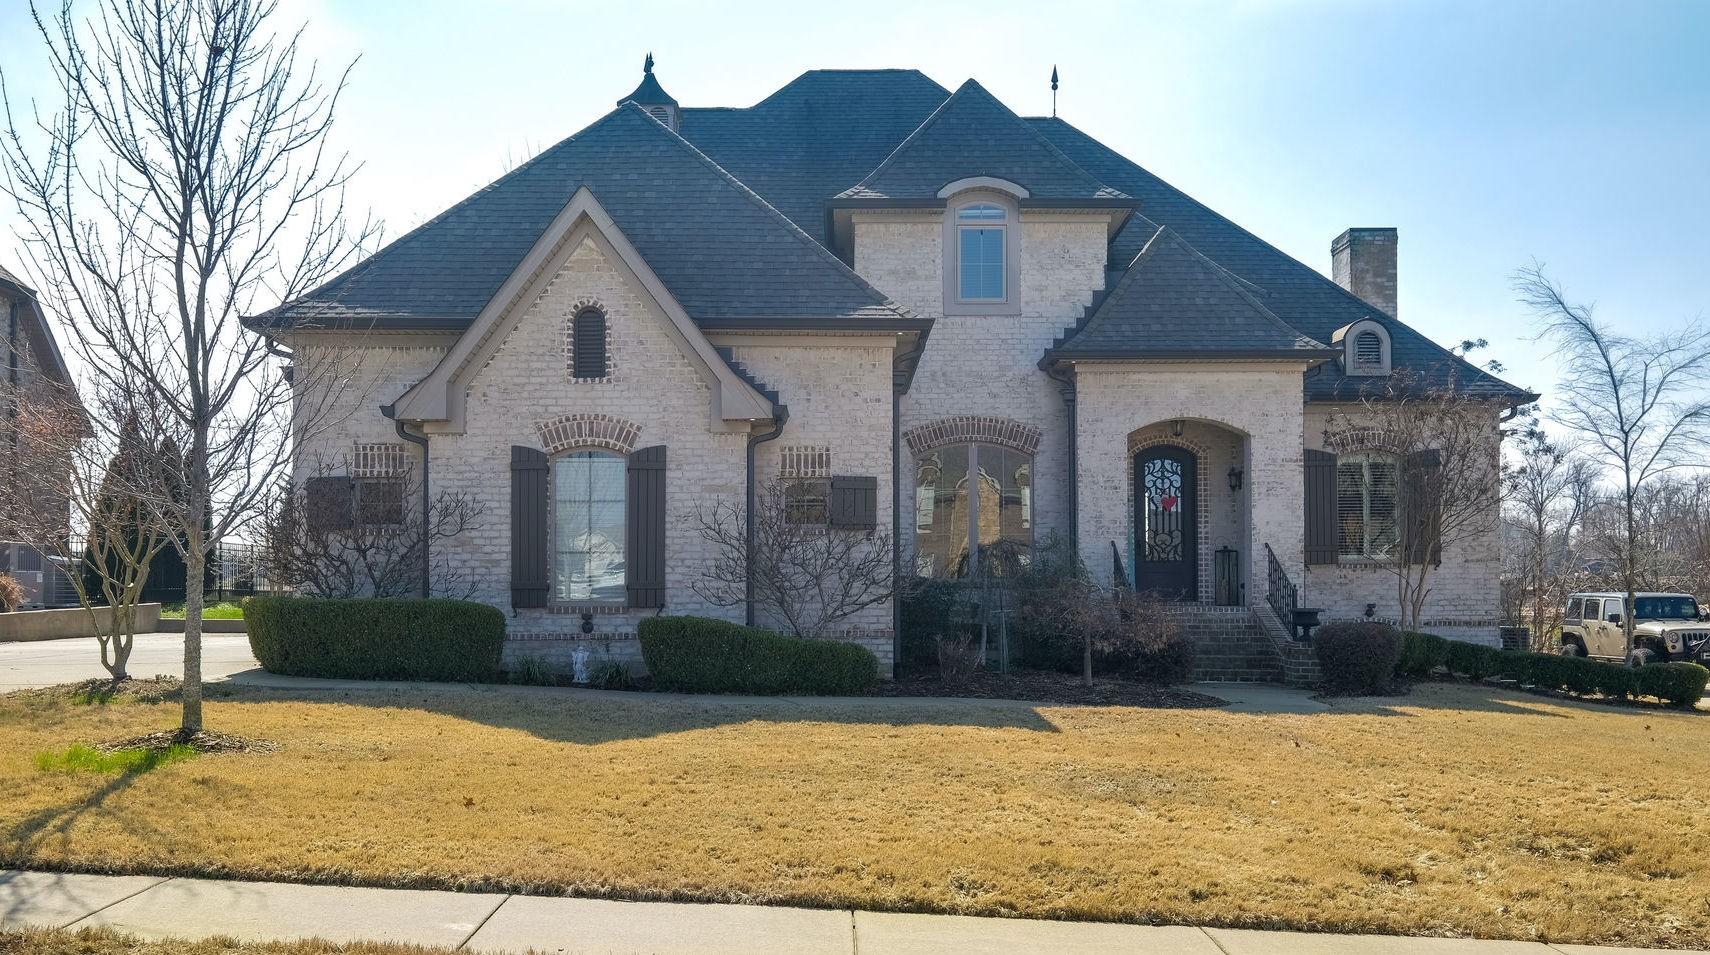 620 Gardenia Way, Murfreesboro, TN 37130 - Murfreesboro, TN real estate listing